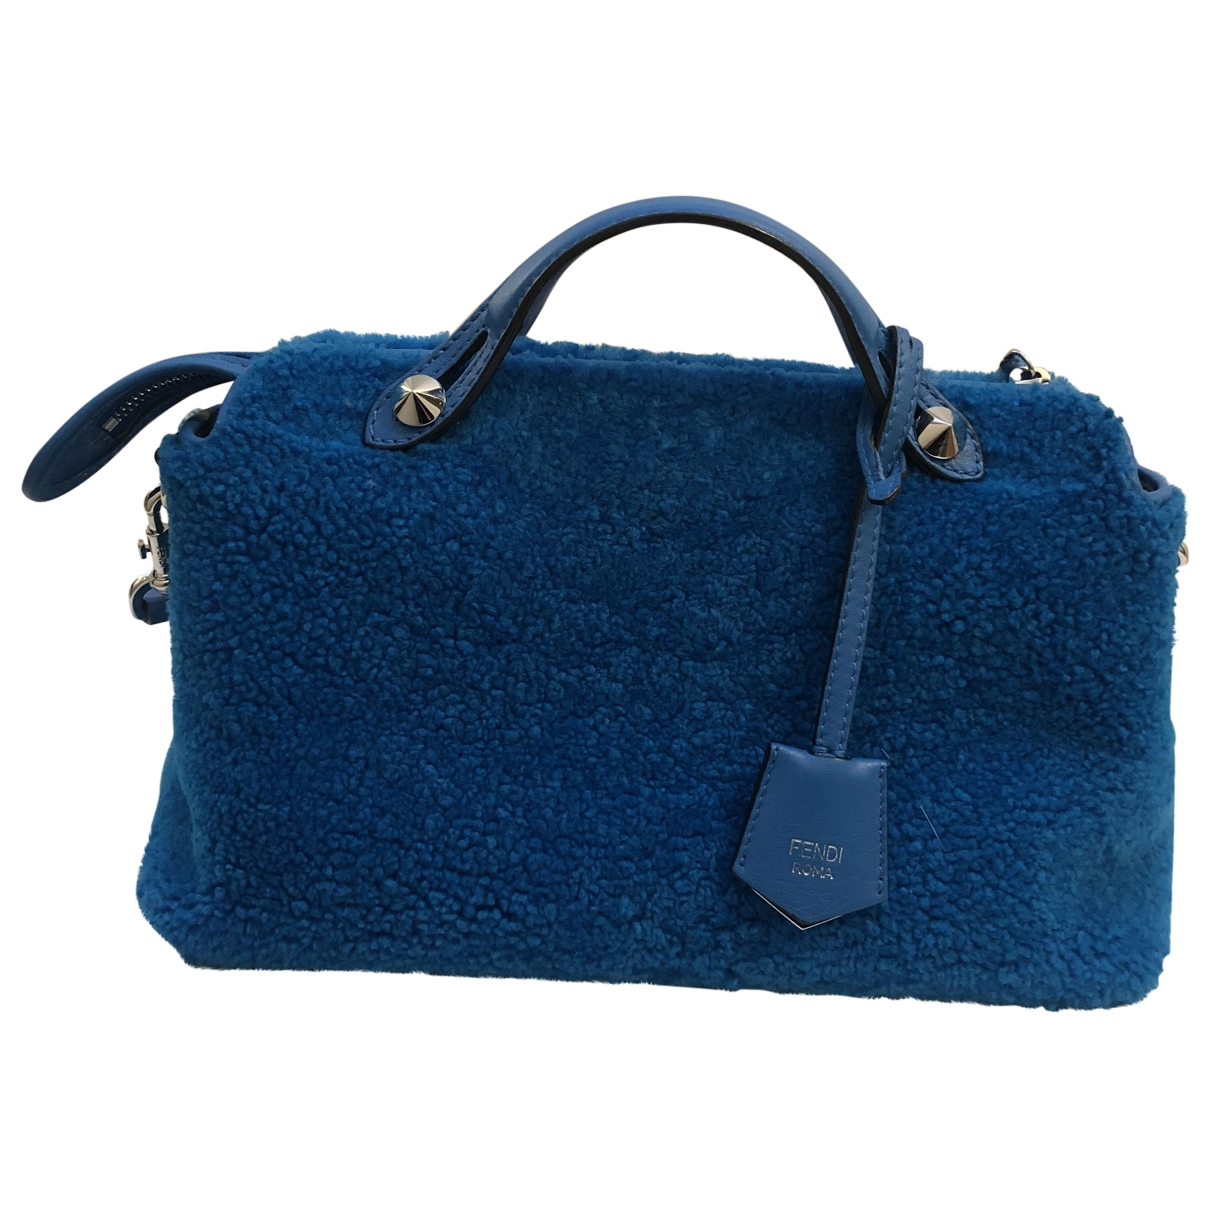 Fendi By The Way  Handtasche in  Tuerkis Fell